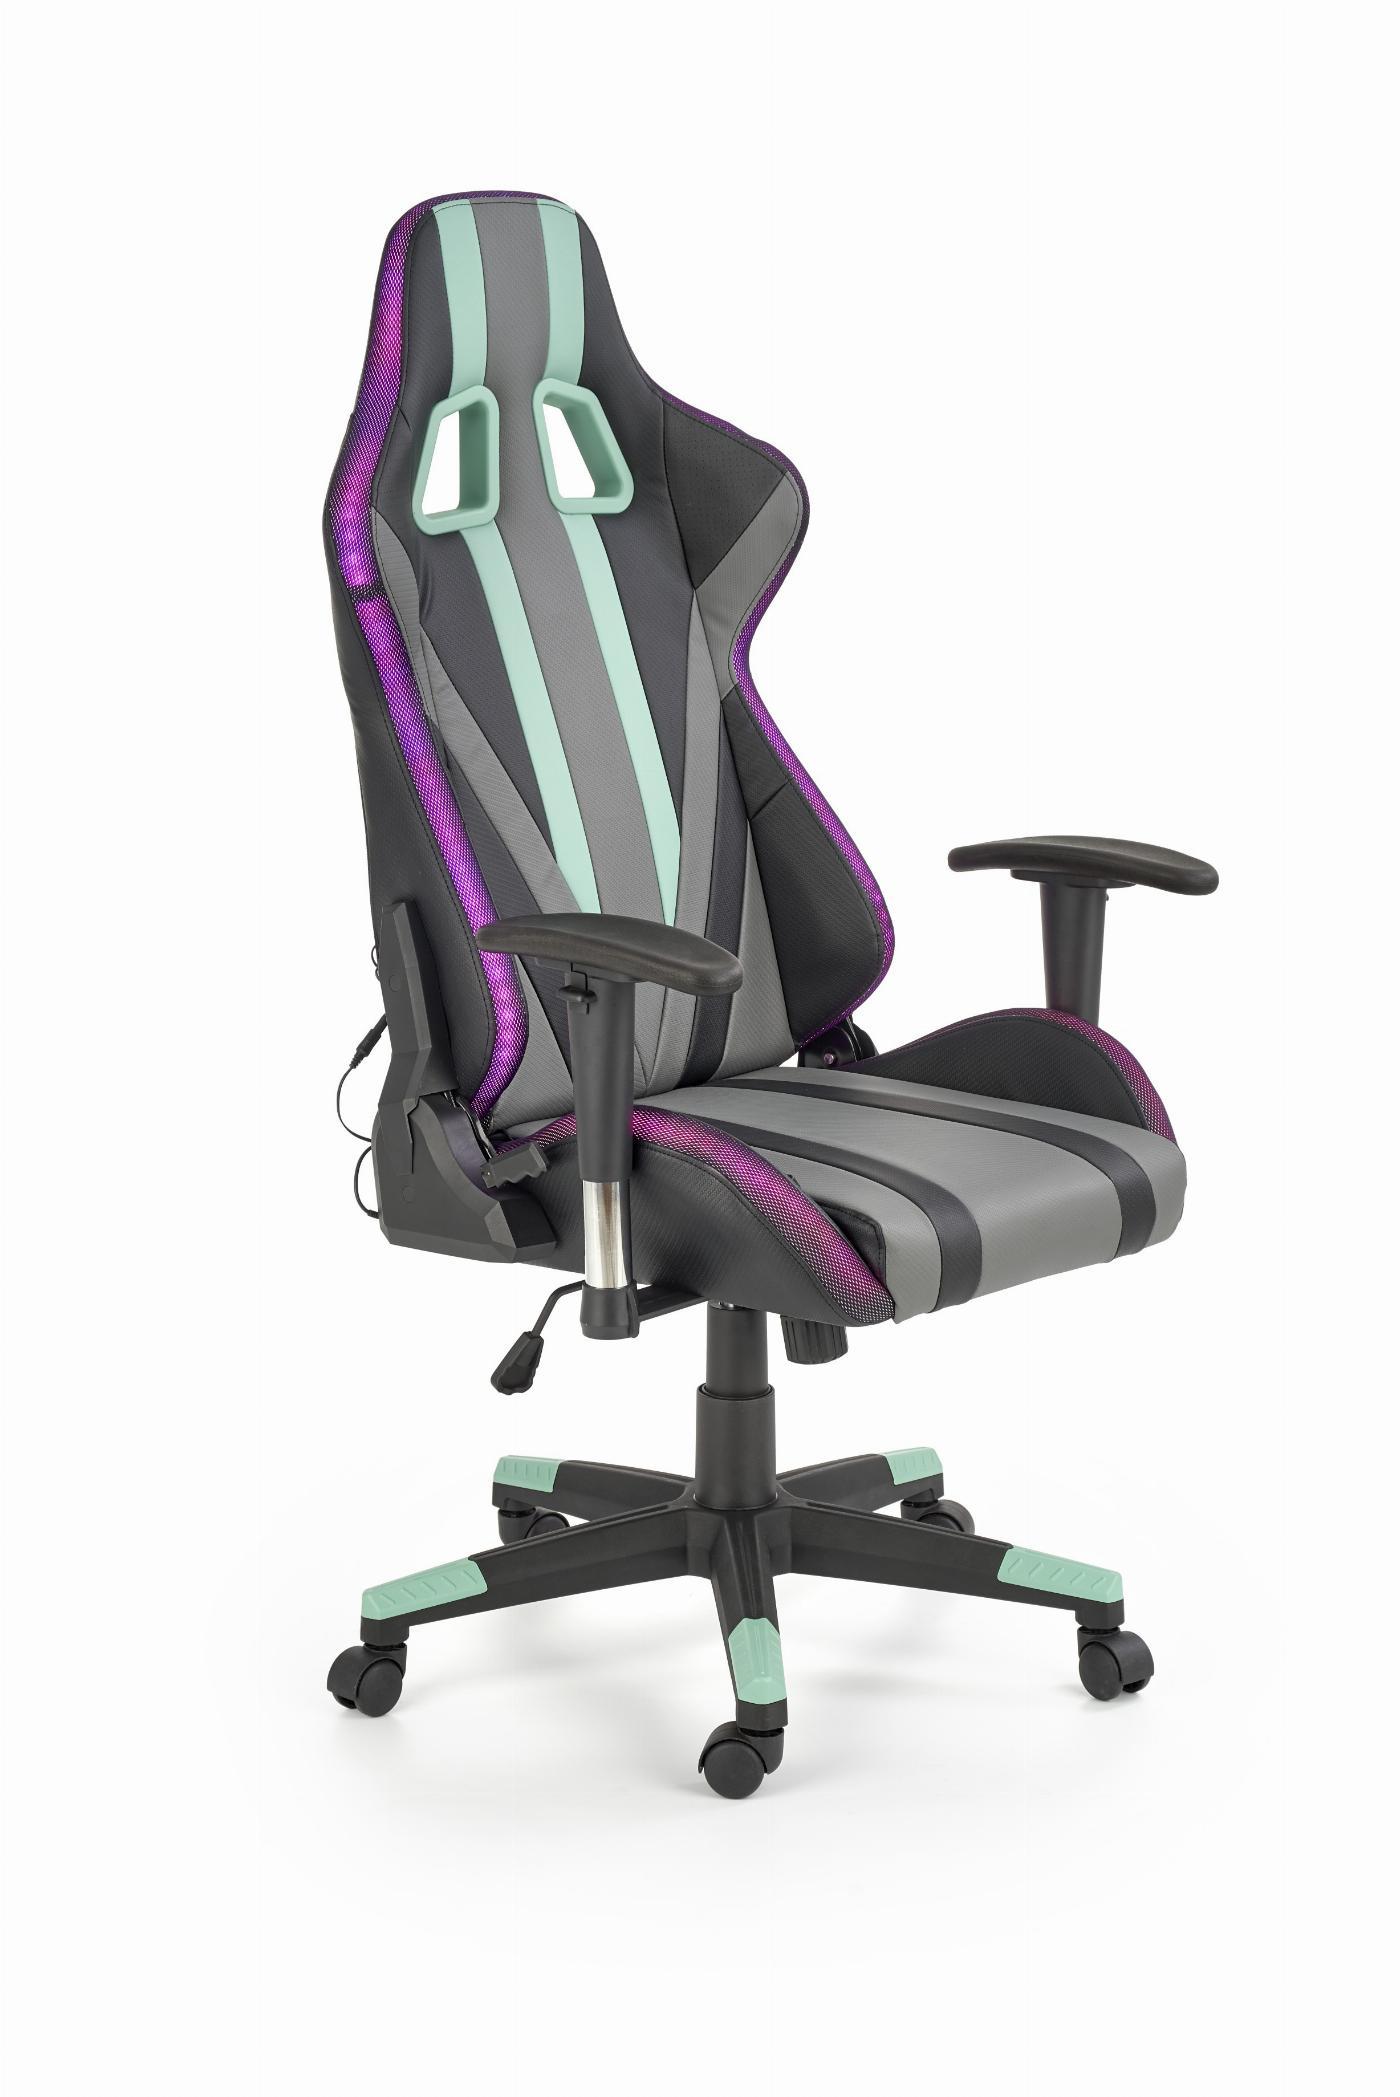 FACTOR fotel gamingowy z LED wielobarwny